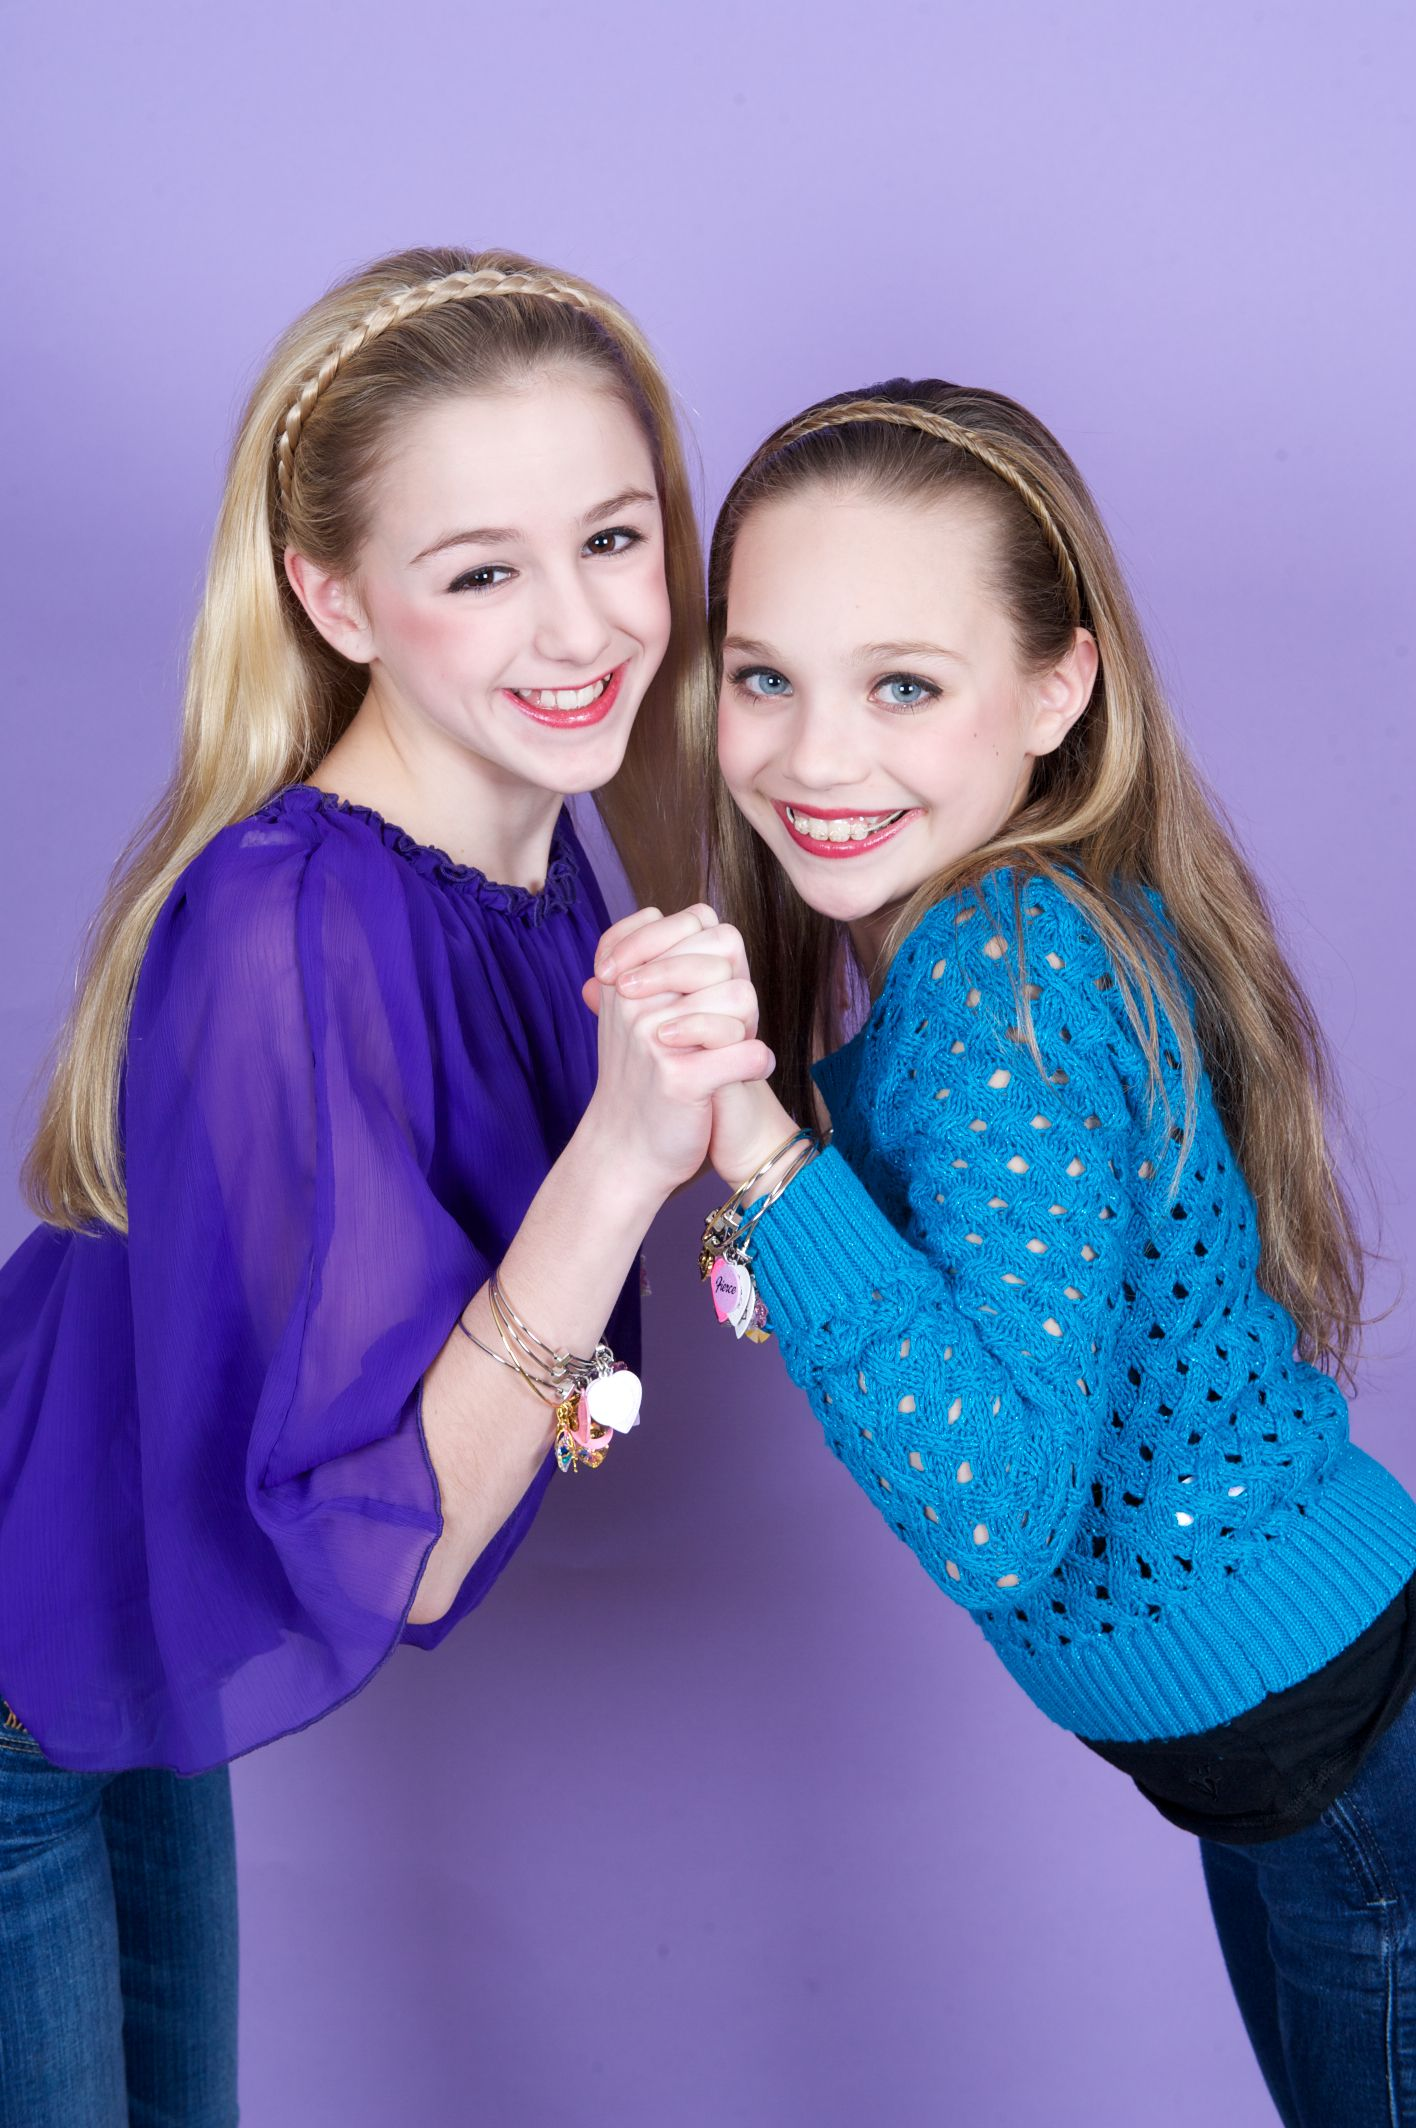 Dance Moms Chloe Lukasiak and Maddie Ziegler | Dance moms ...